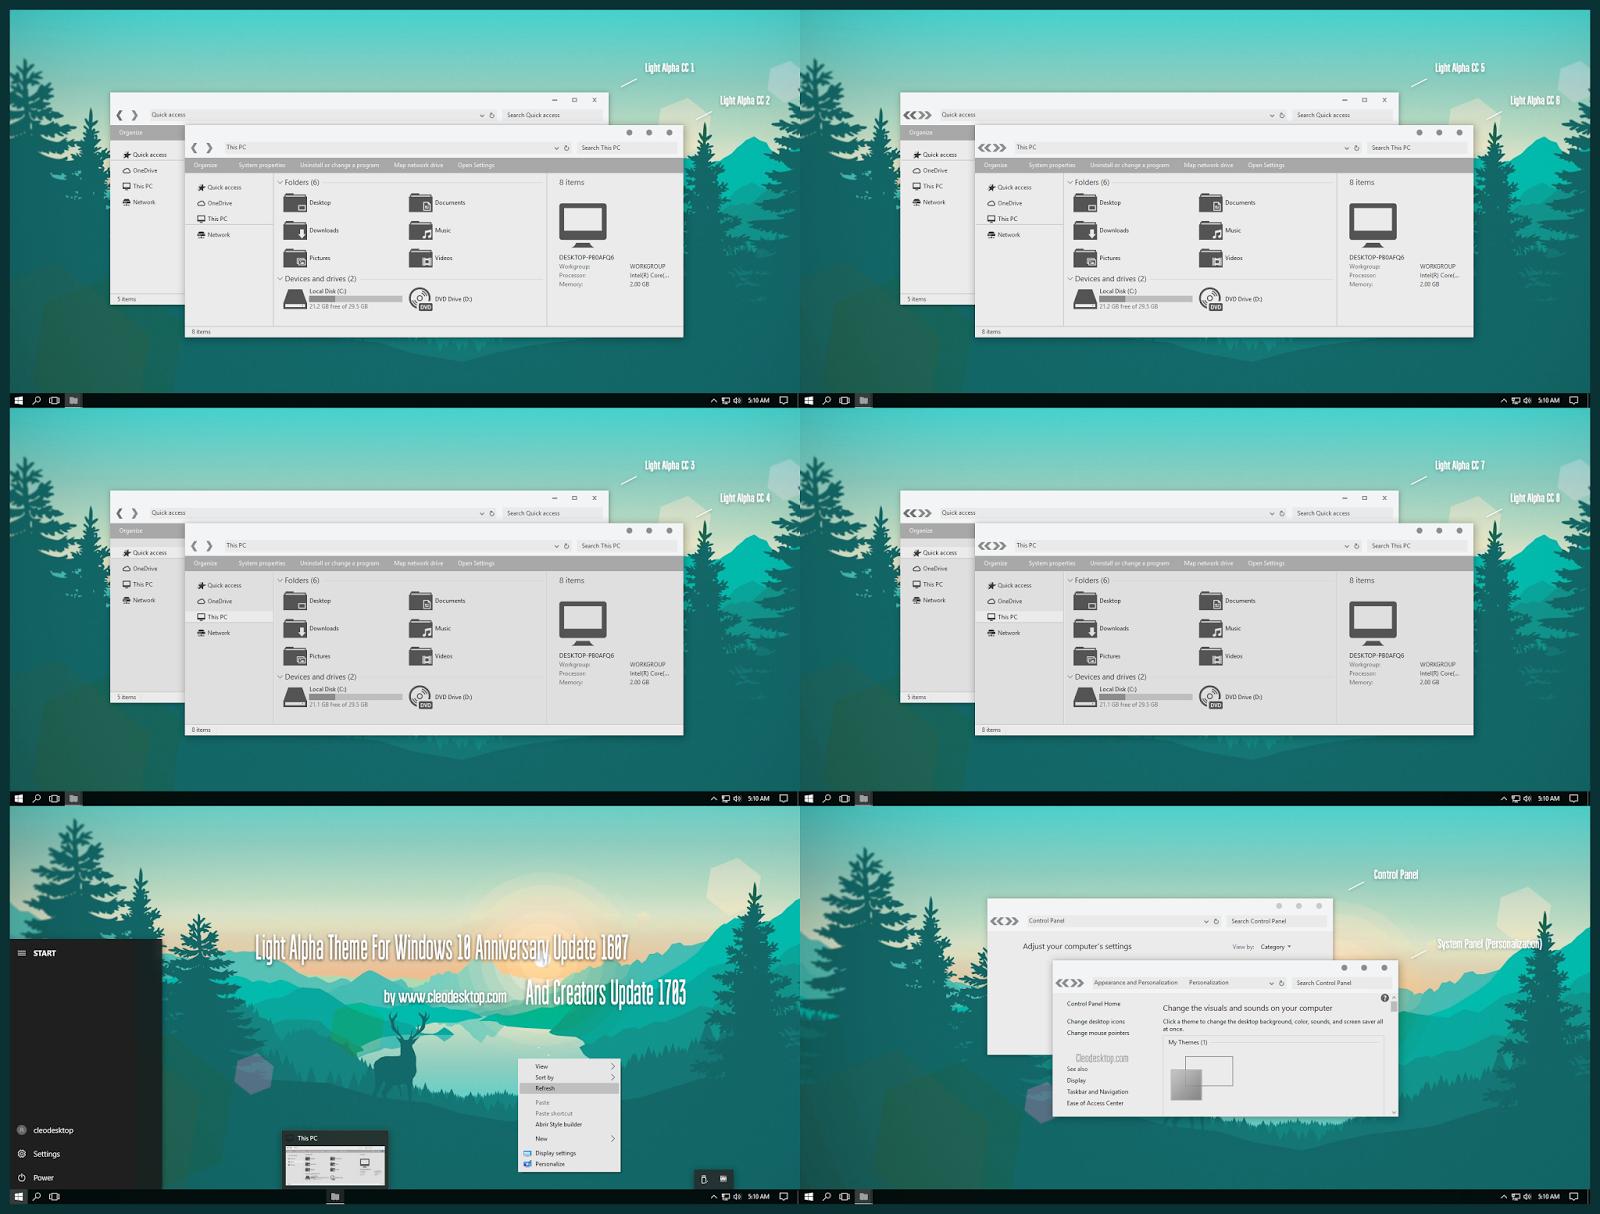 Light Alpha CC Theme Windows10 Creators Update 1703   Windows10 Themes I Cleodesktop